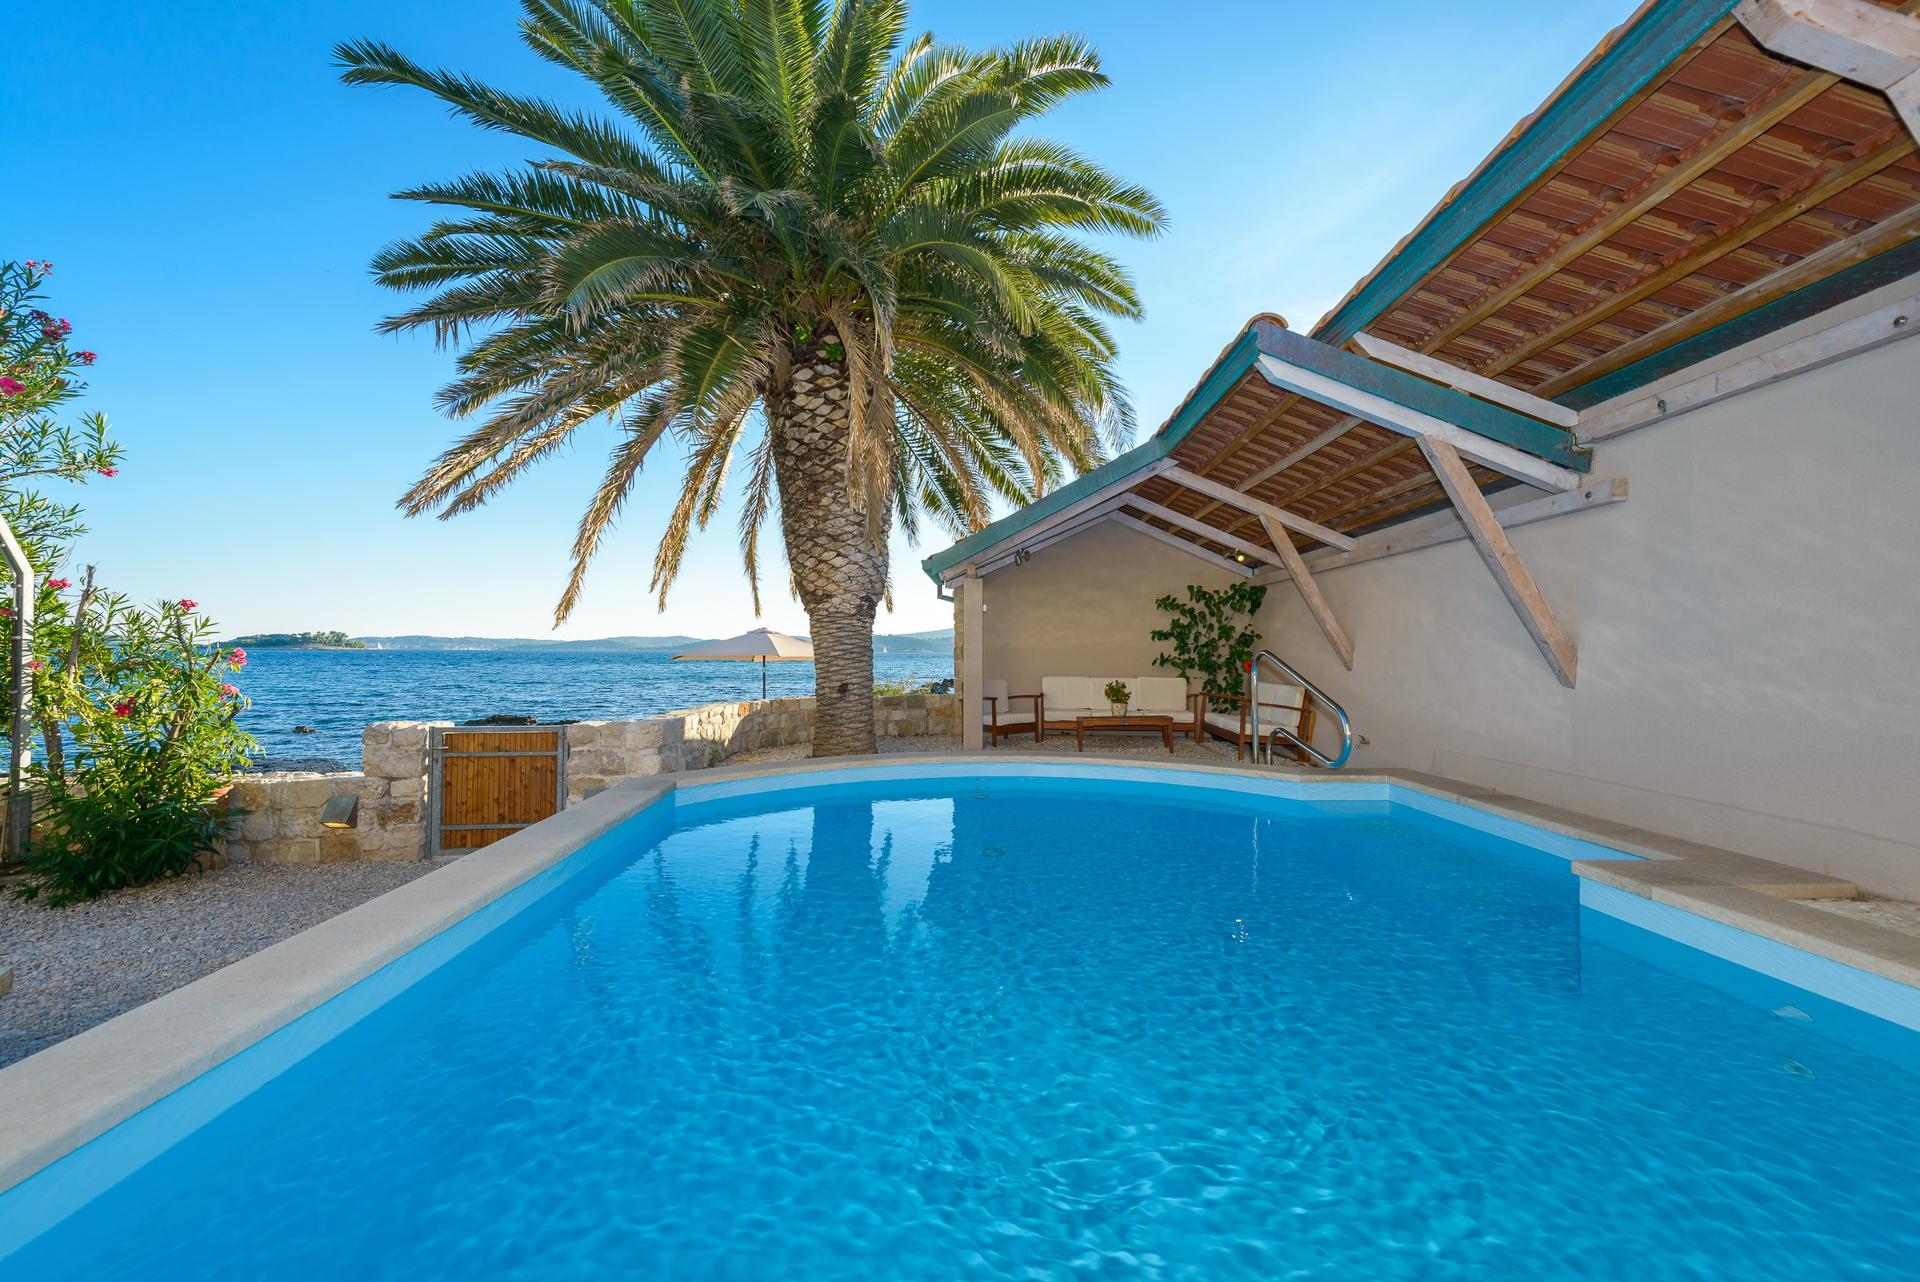 Villa de Maris with Swimming pool